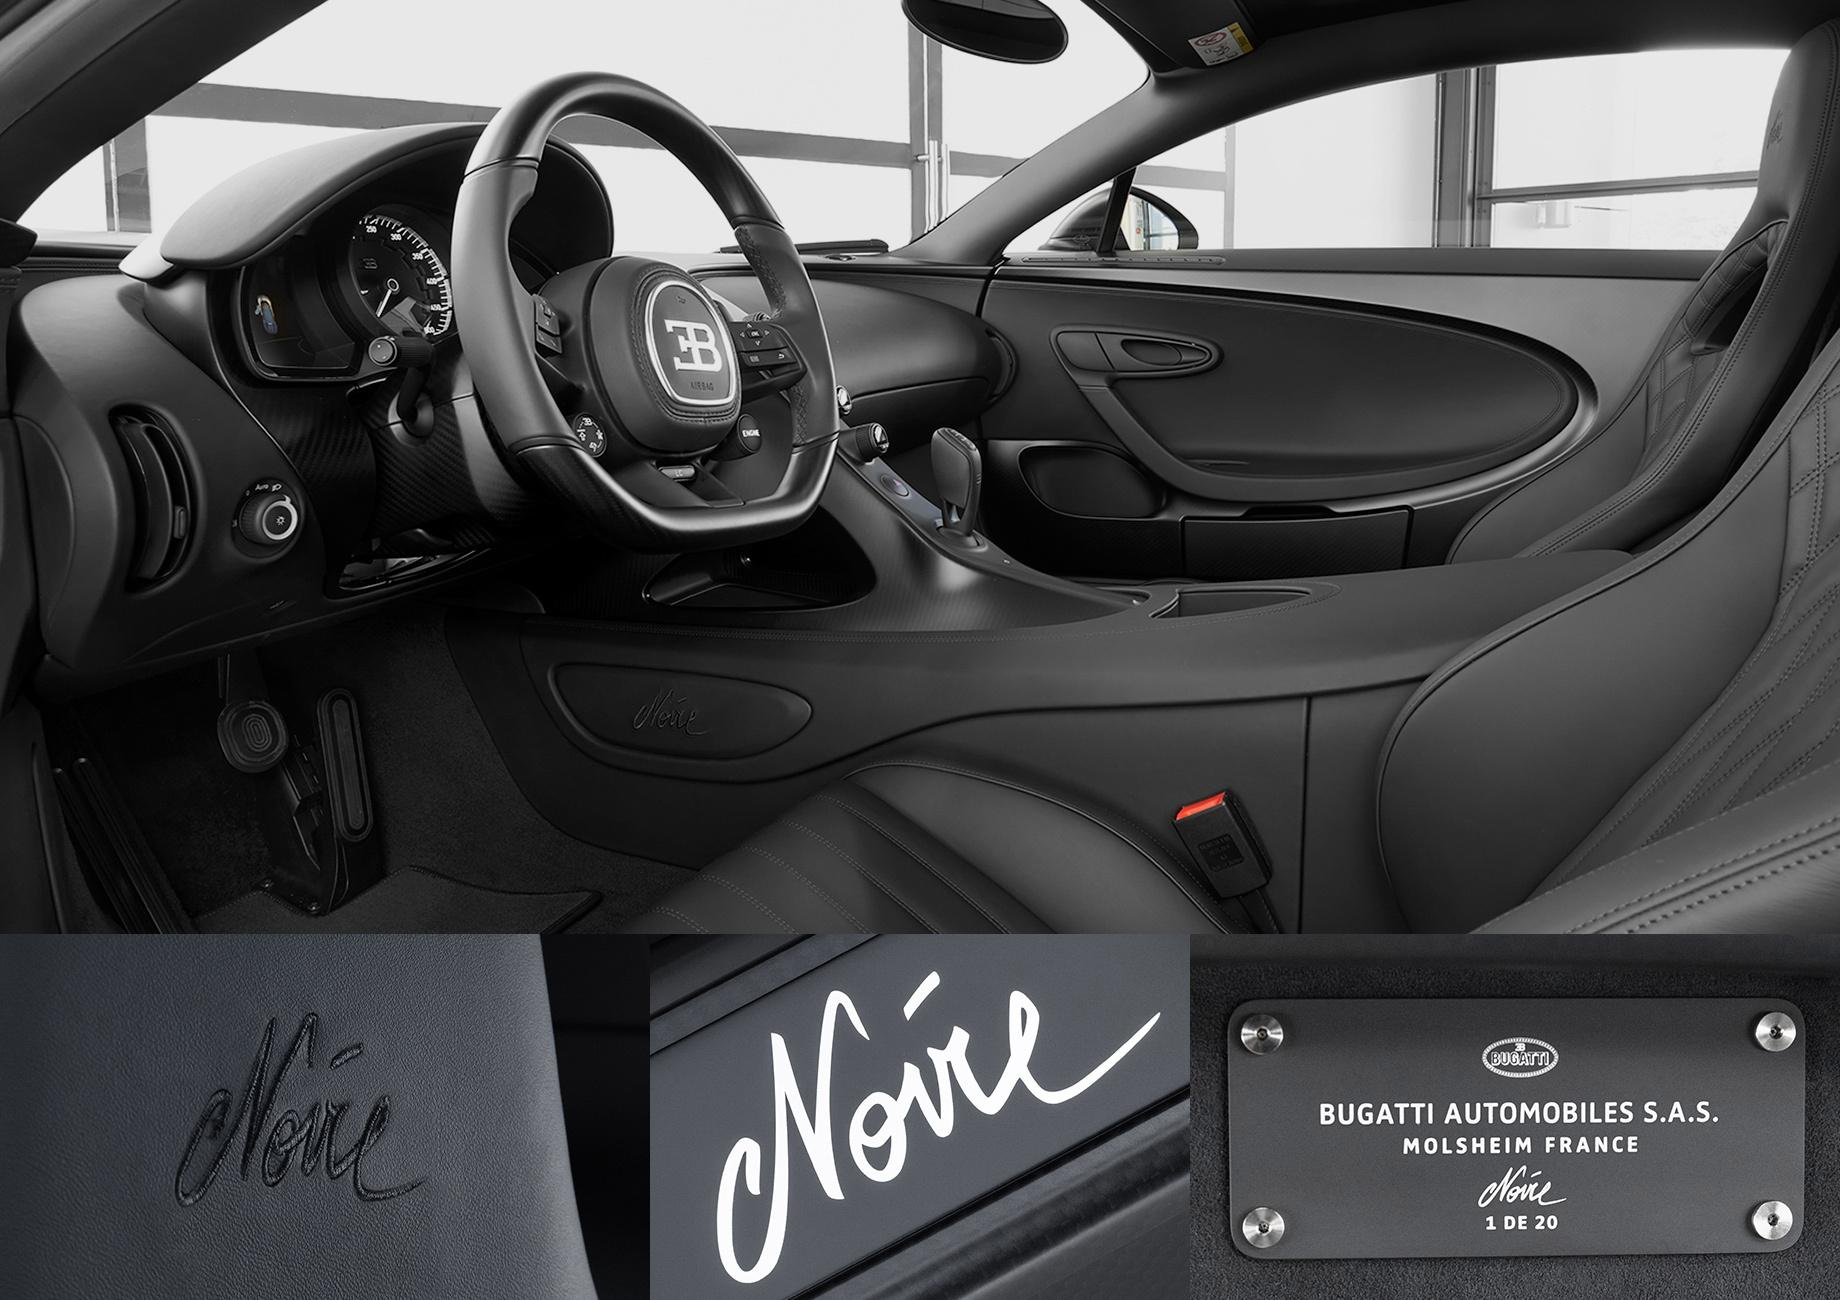 Гиперкар Bugatti Chiron преодолел середину производственного цикла